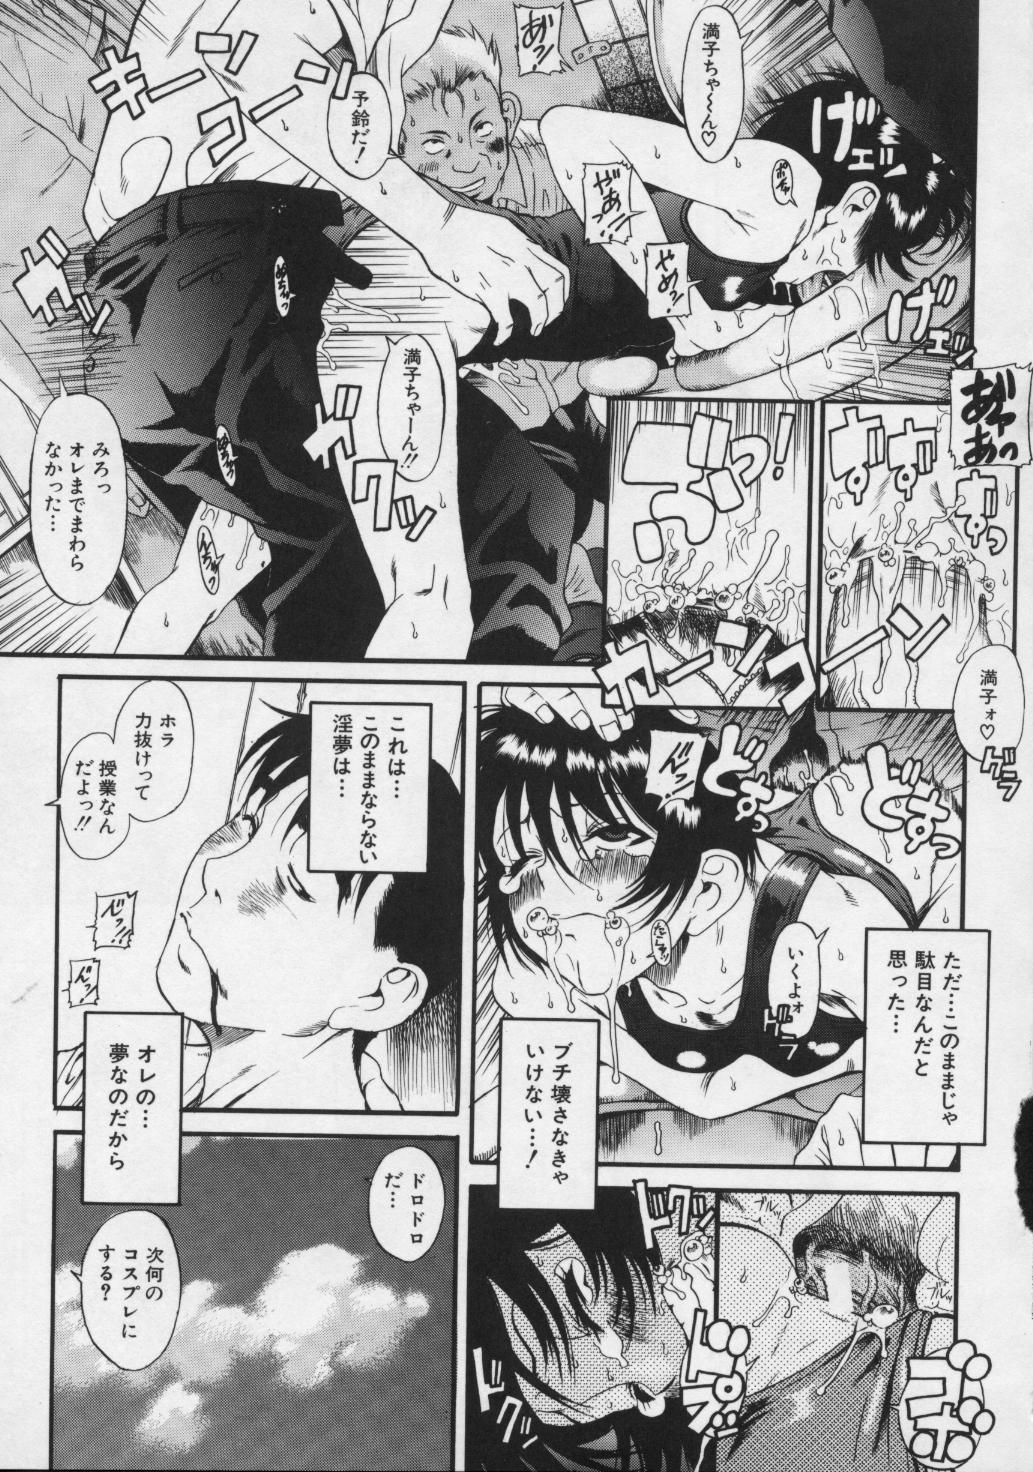 Kimi no Na o Yobeba - If I call your name. 78